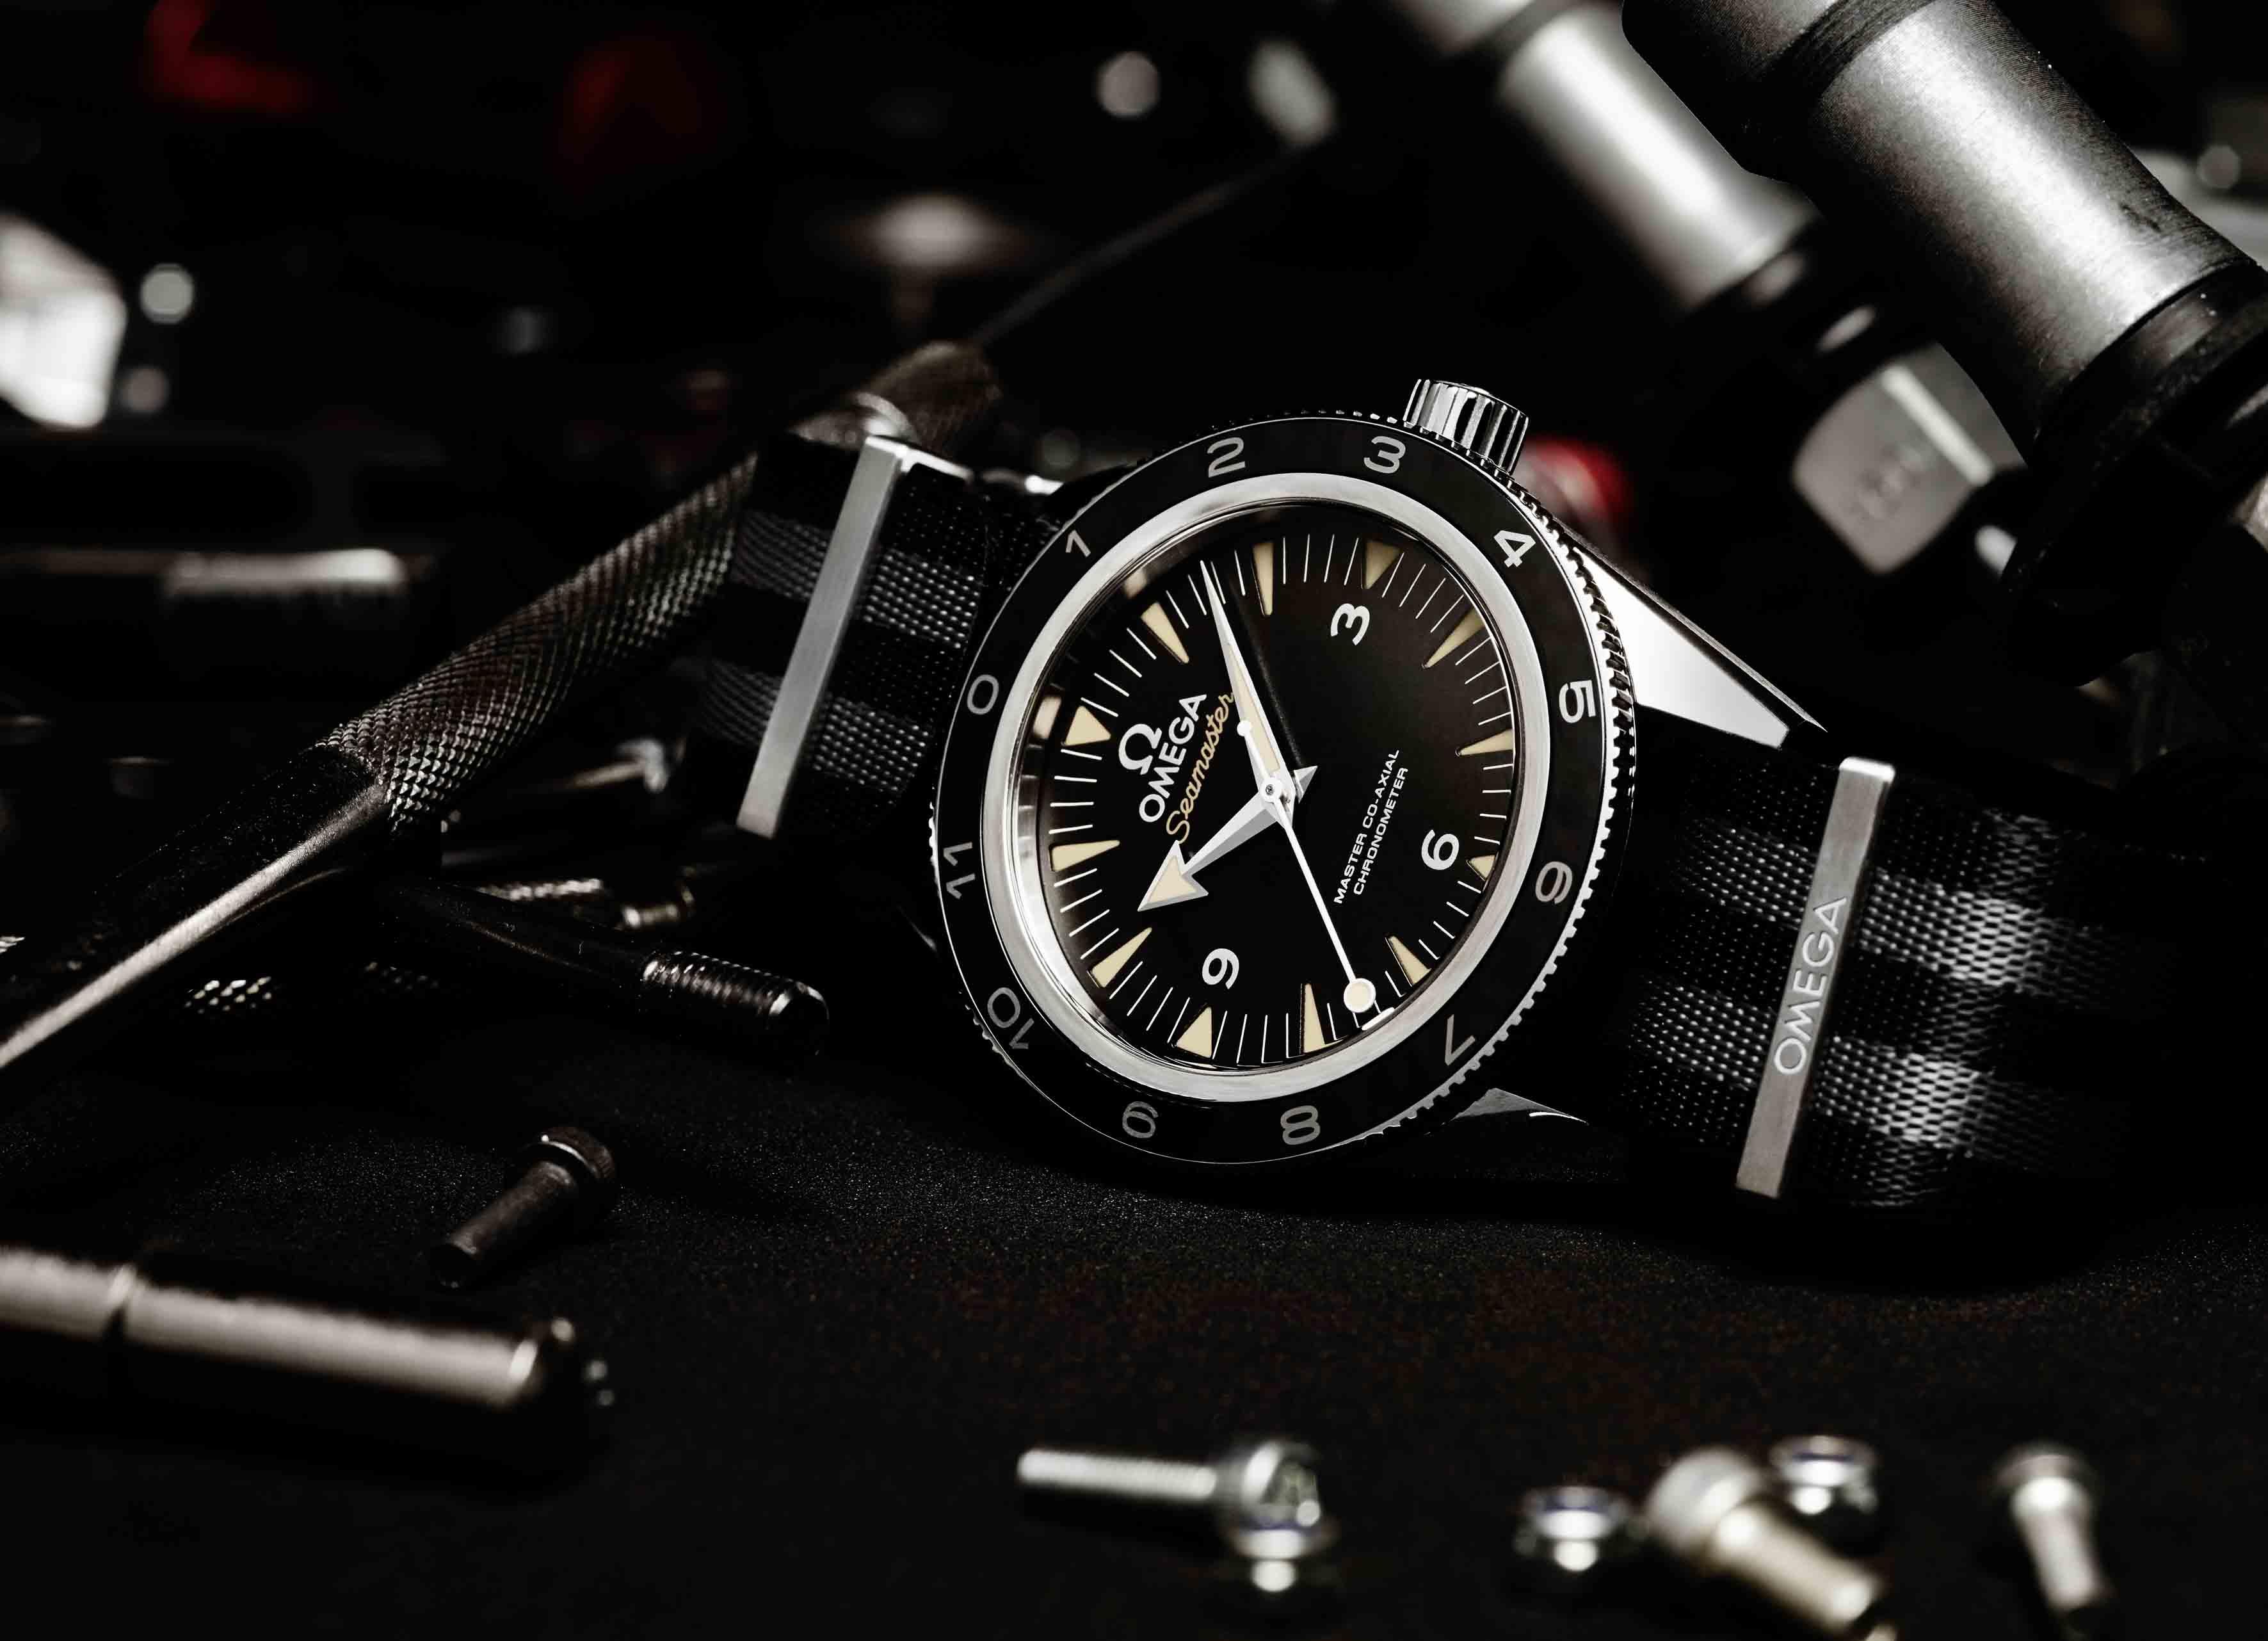 The OMEGA Seamaster 300 Bond